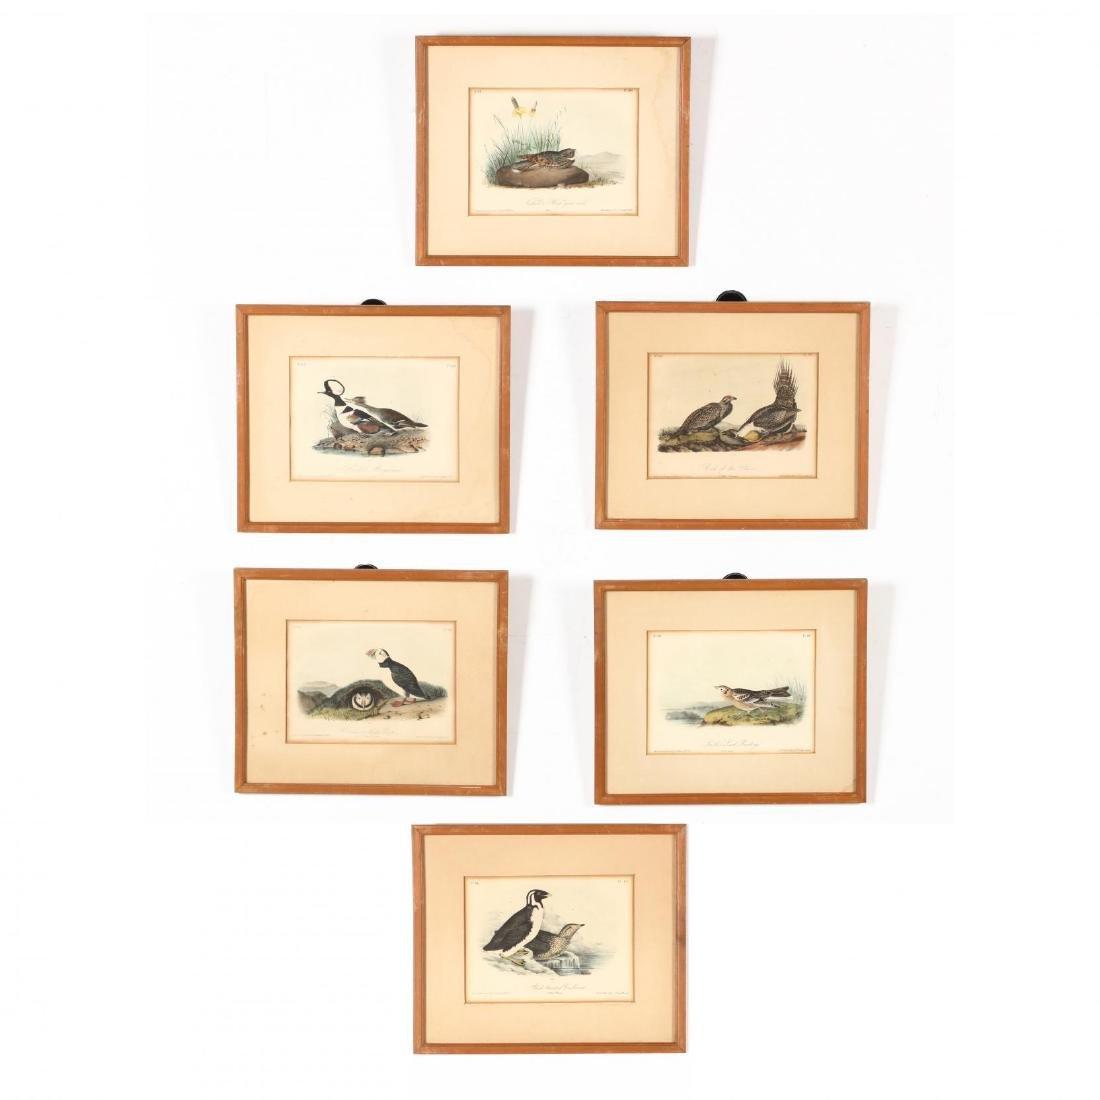 after John James Audubon (Am., 1785-1851), Six Prints